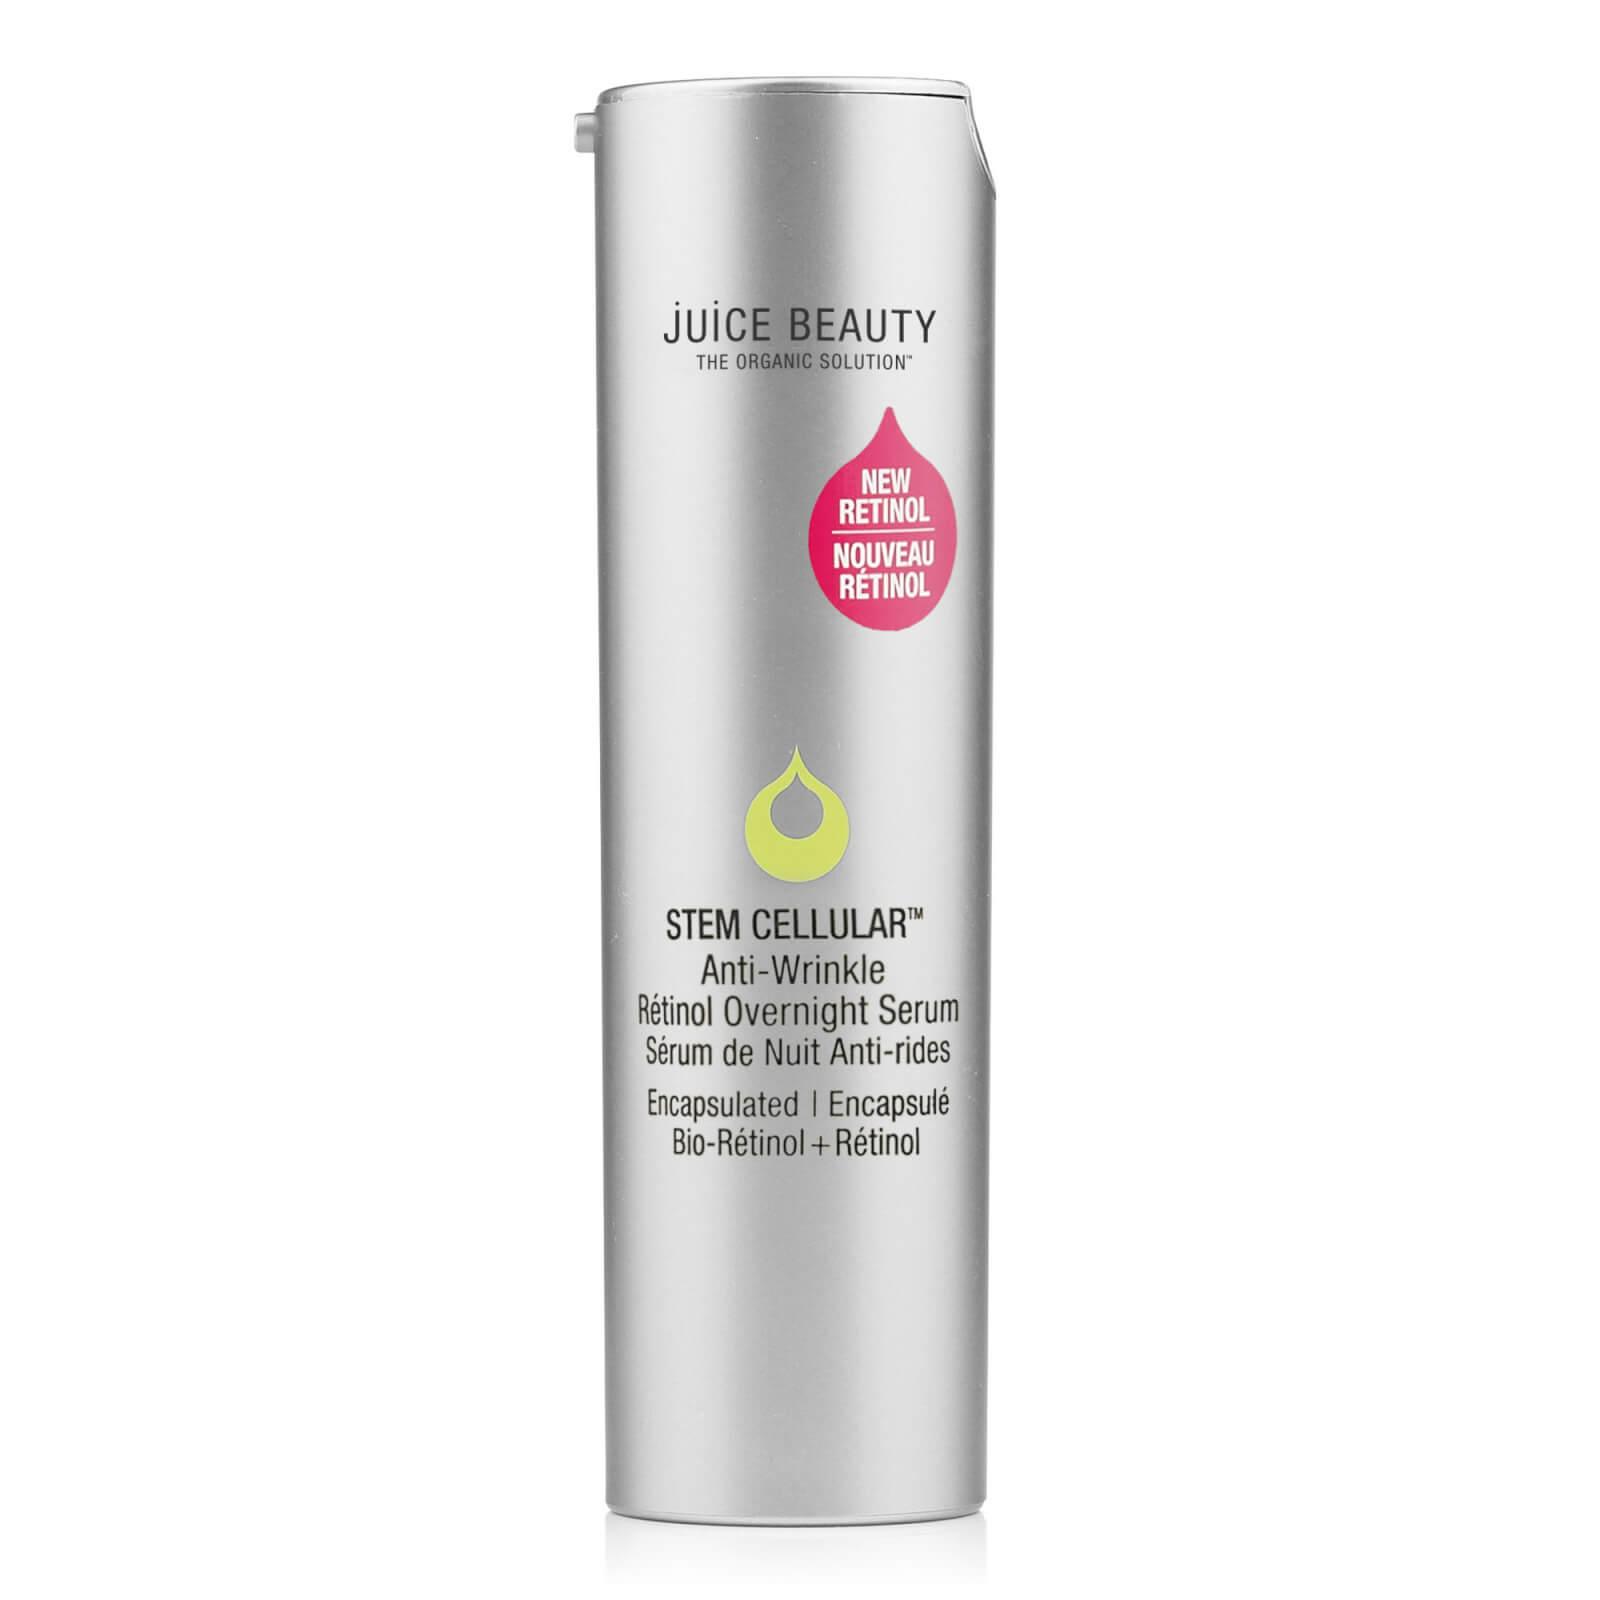 Juice Beauty Serums STEM CELLULAR ANTI-WRINKLE RETINOL OVERNIGHT SERUM 30ML